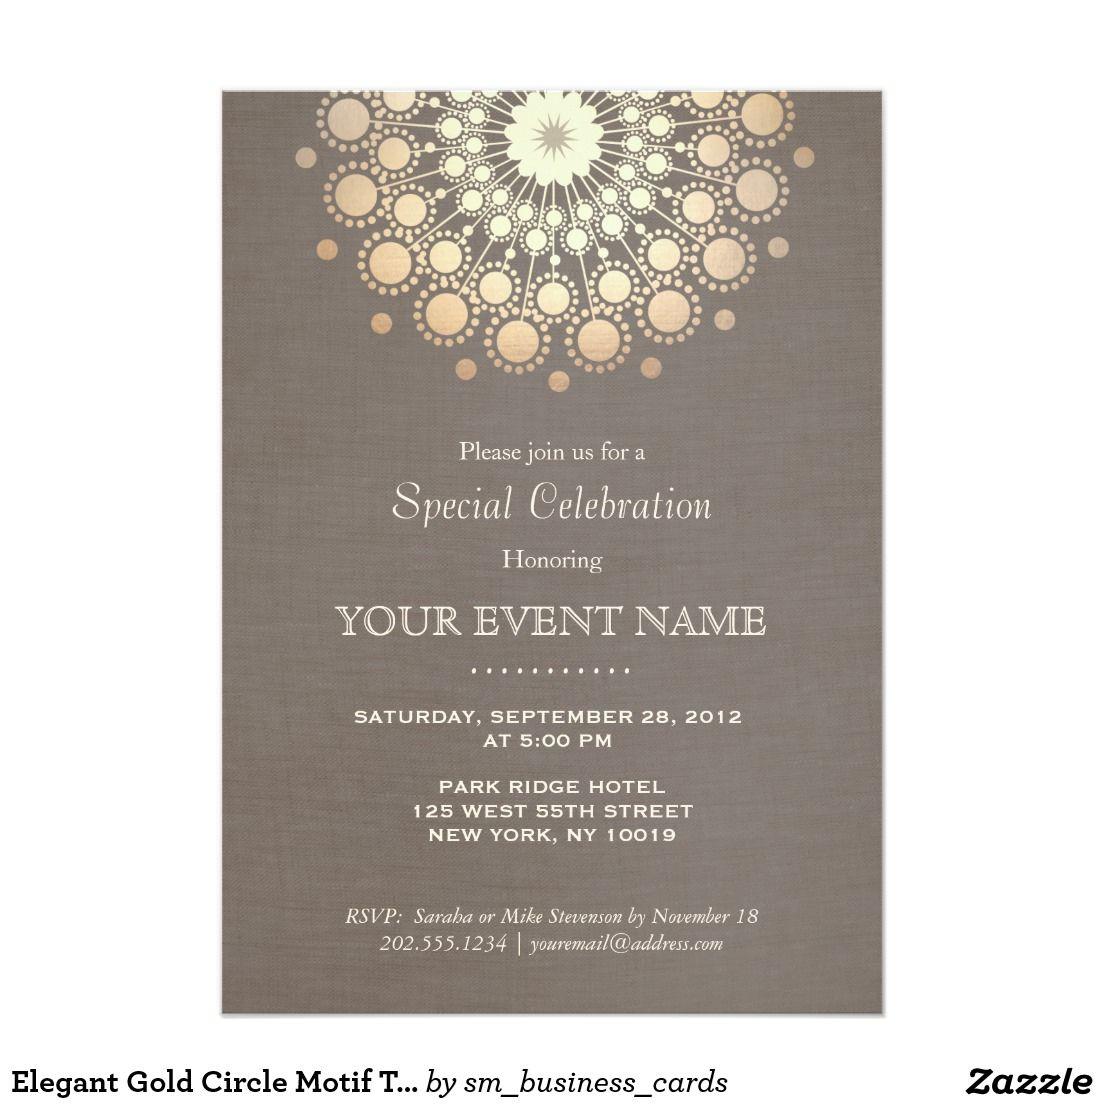 Elegant Gold Circle Motif Taupe Linen Look Formal Card | Formal invitation,  Dinner invitation template, Invitation template